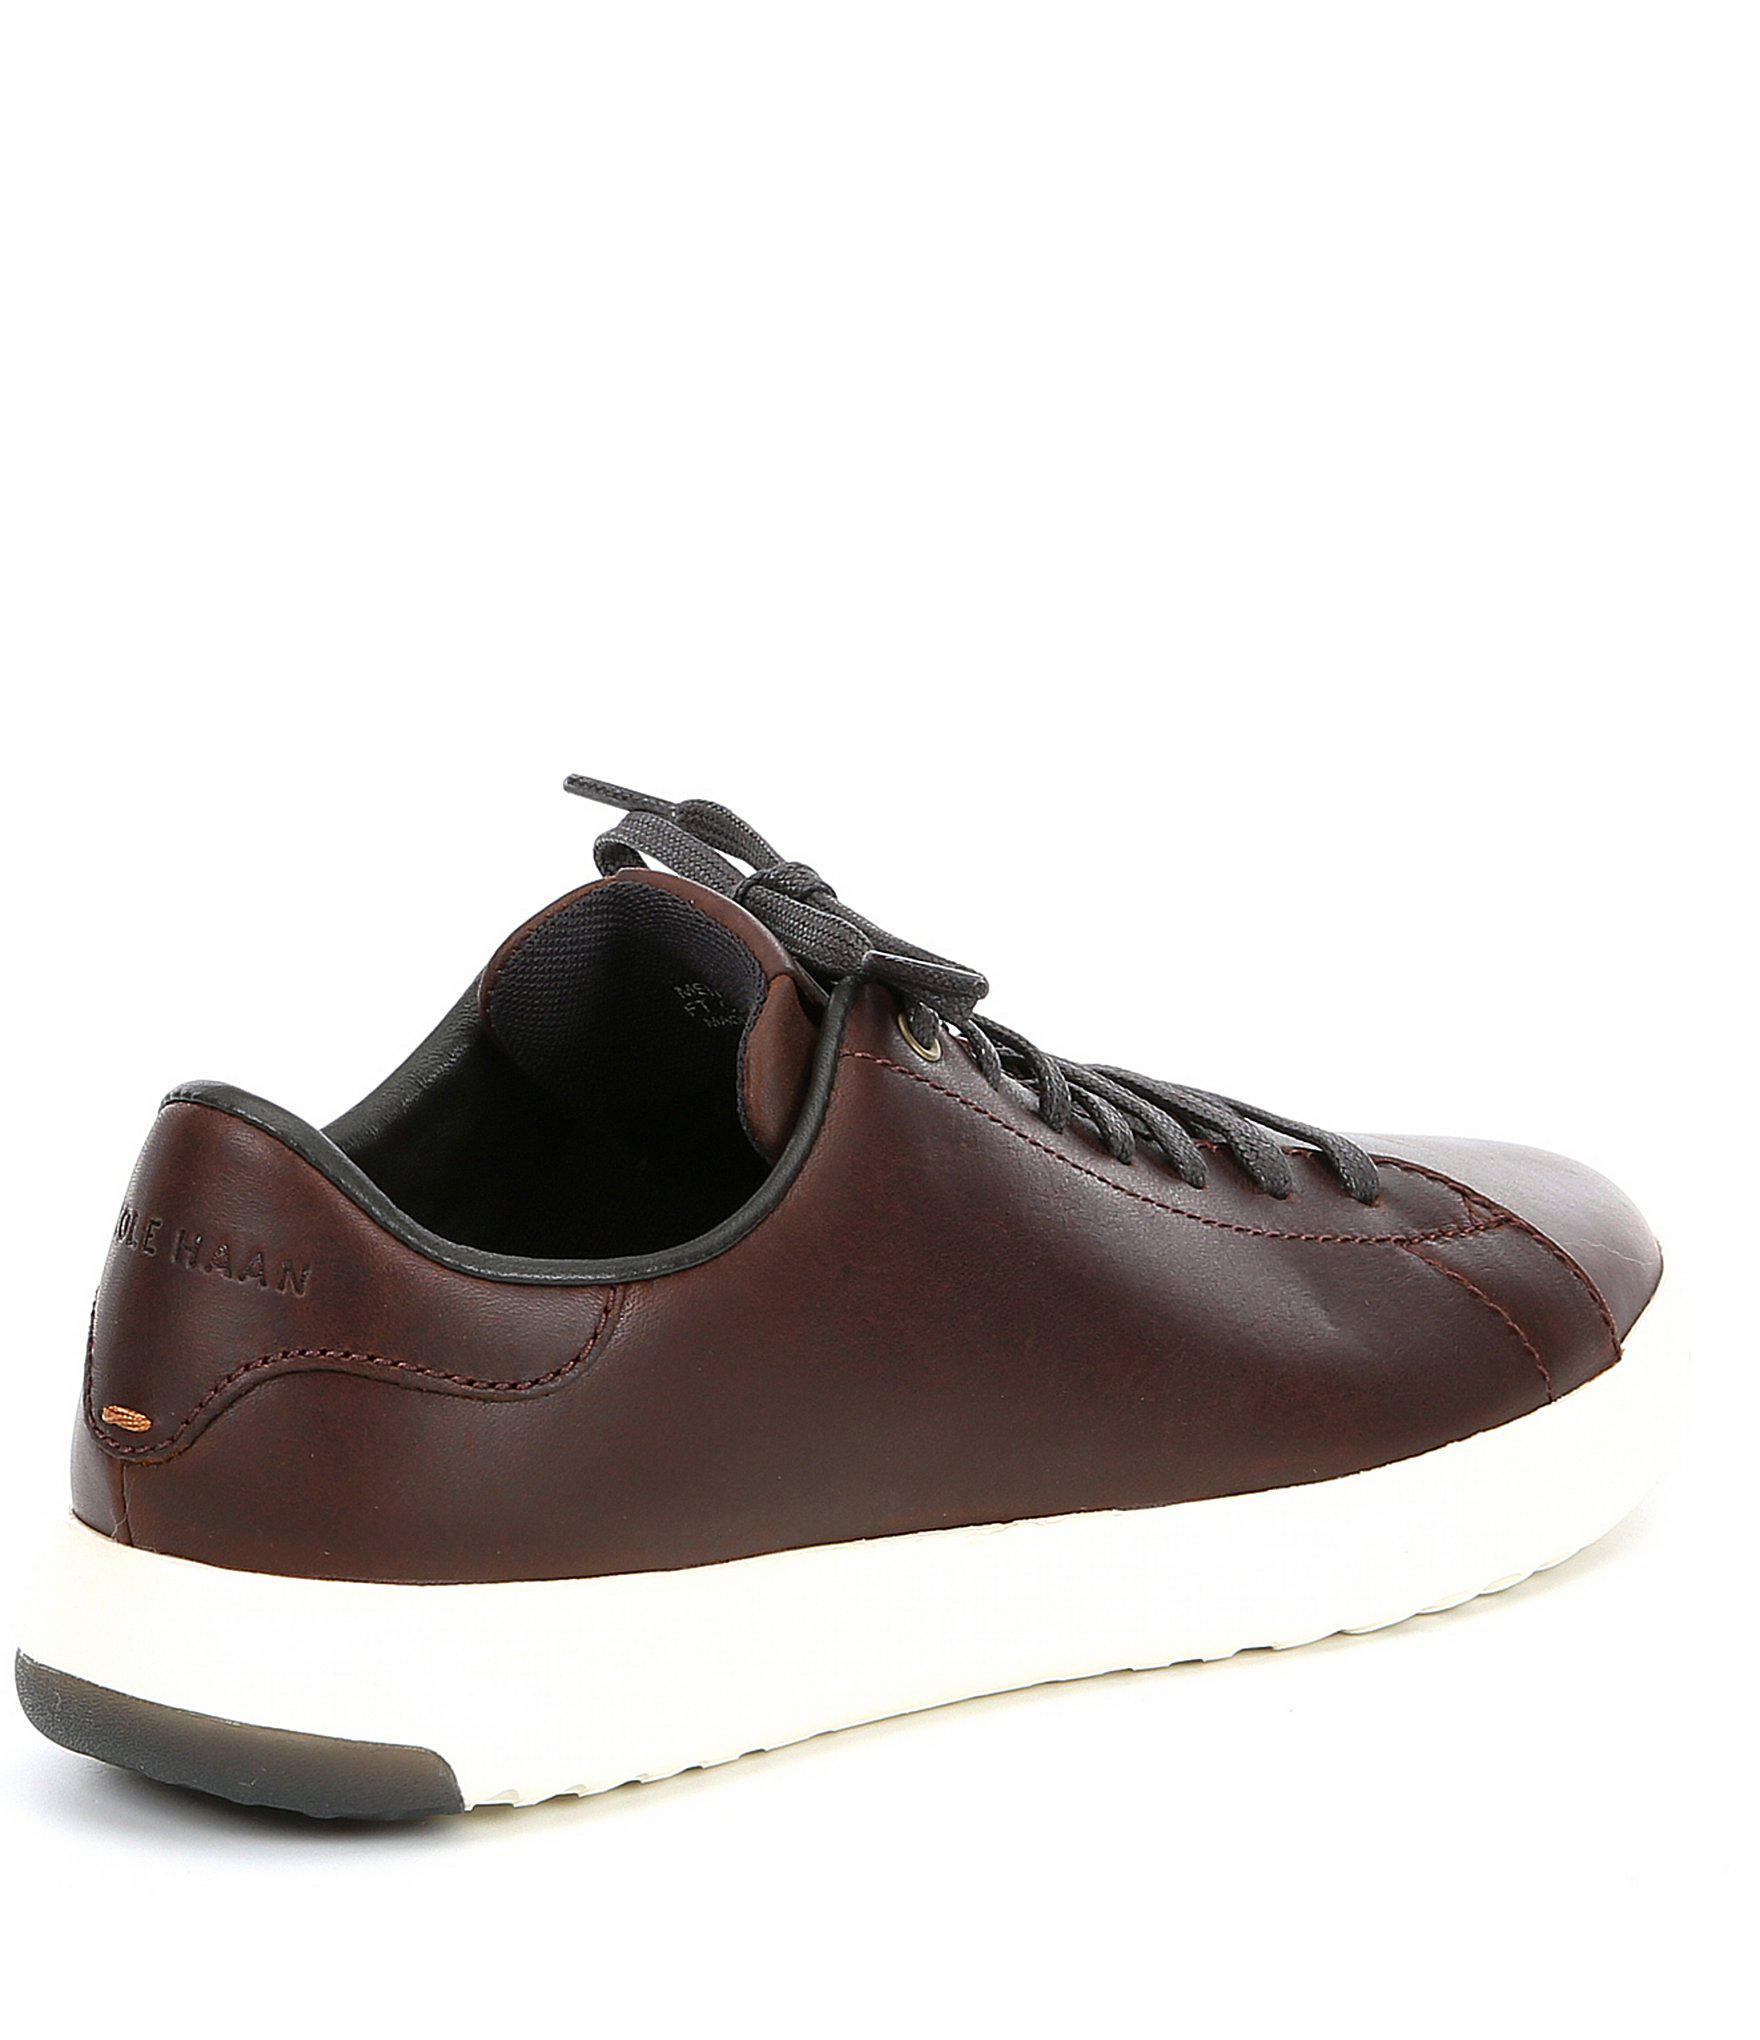 4415f9a155 Cole Haan - Brown Men's Grandpro Leather Tennis Shoe for Men - Lyst. View  fullscreen